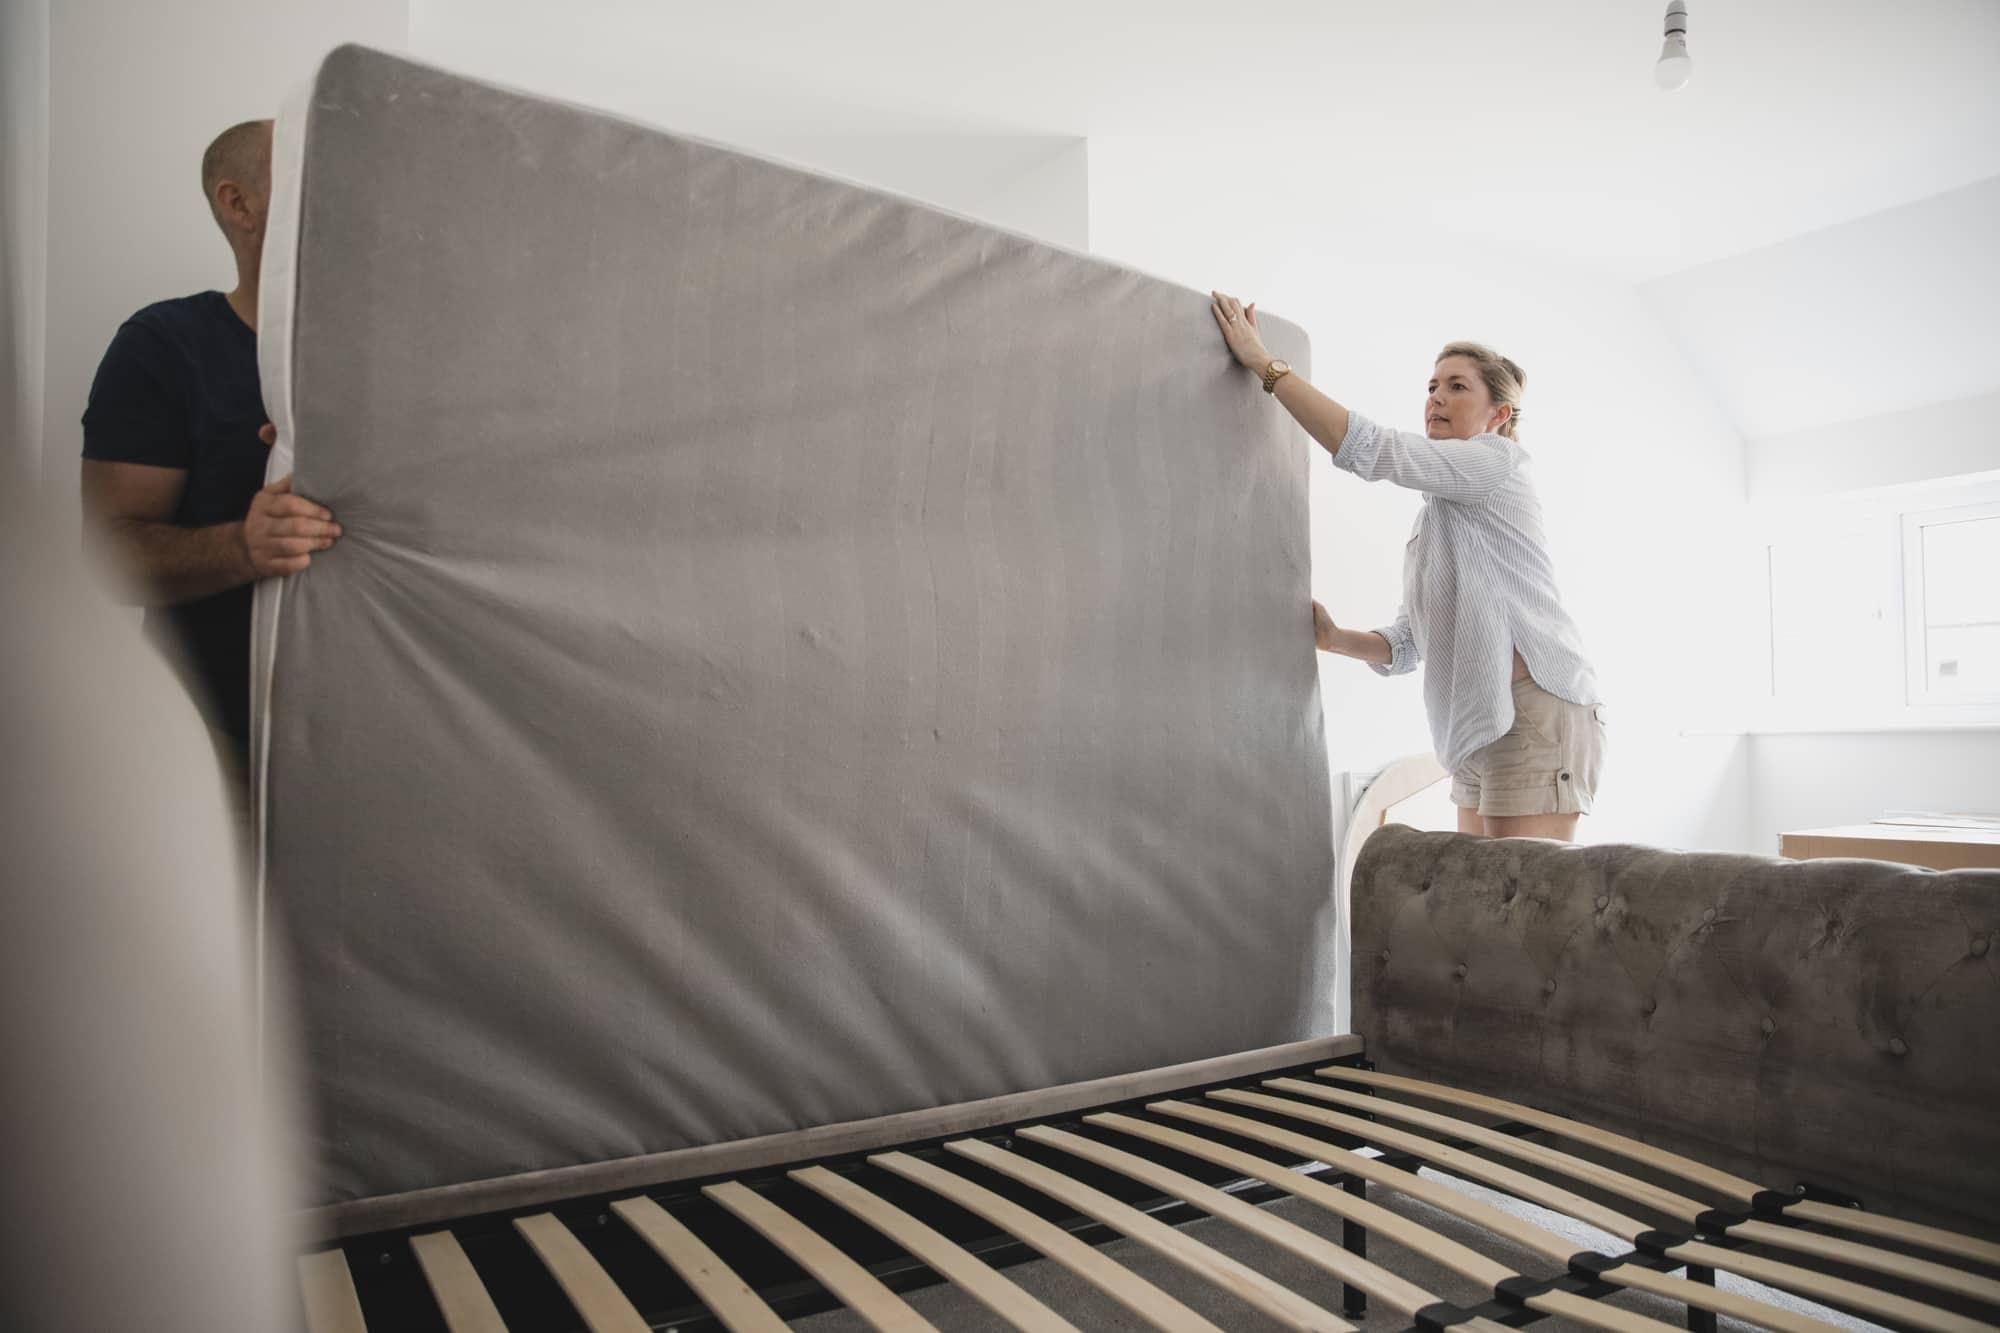 transporting a mattress